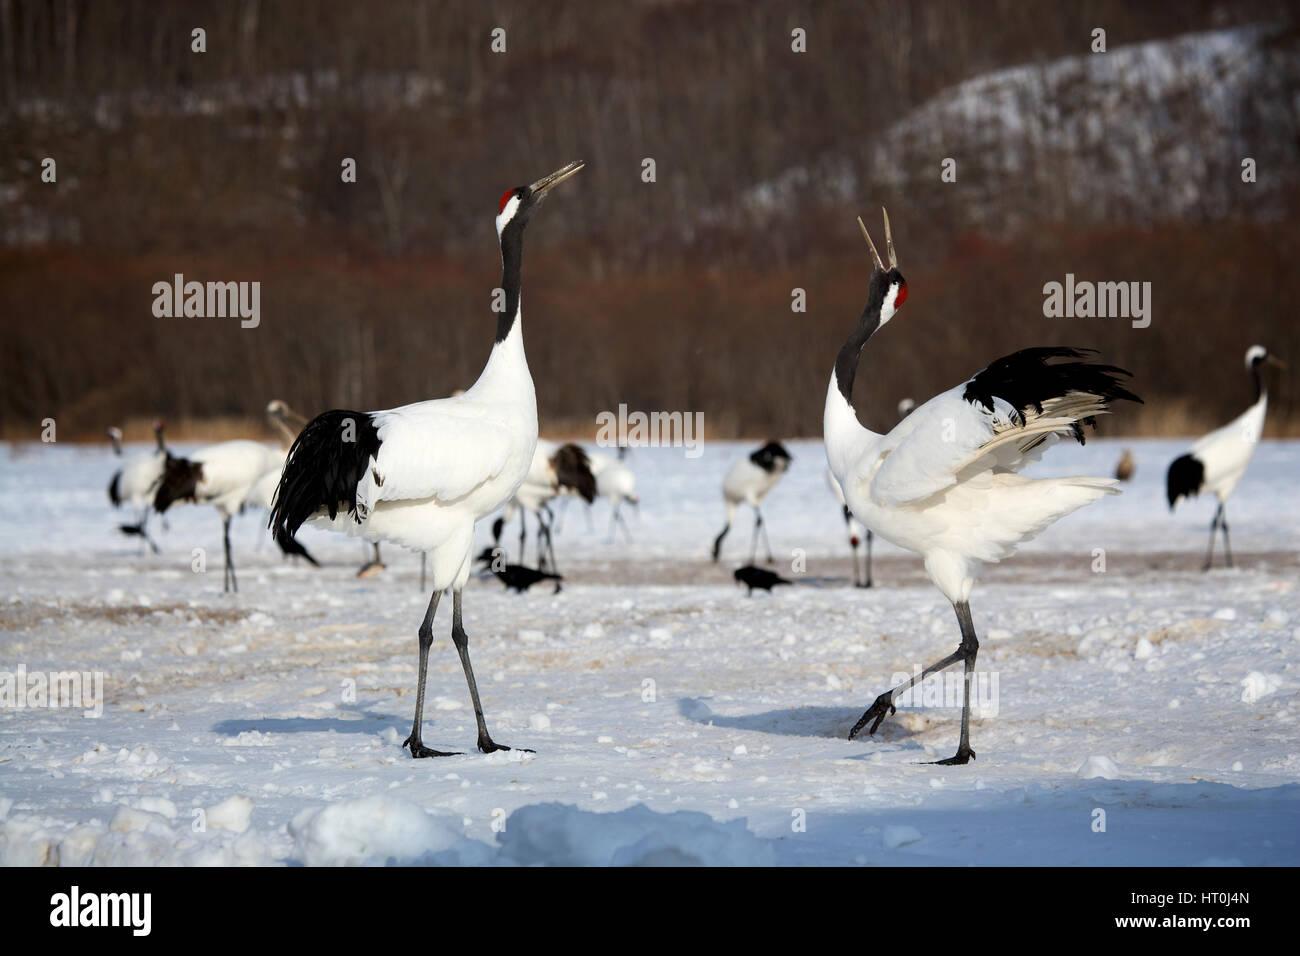 Japanese crane (Grus japonensis), courtship behavior, Akan Reserve, Hokkaido, Japan - Stock Image